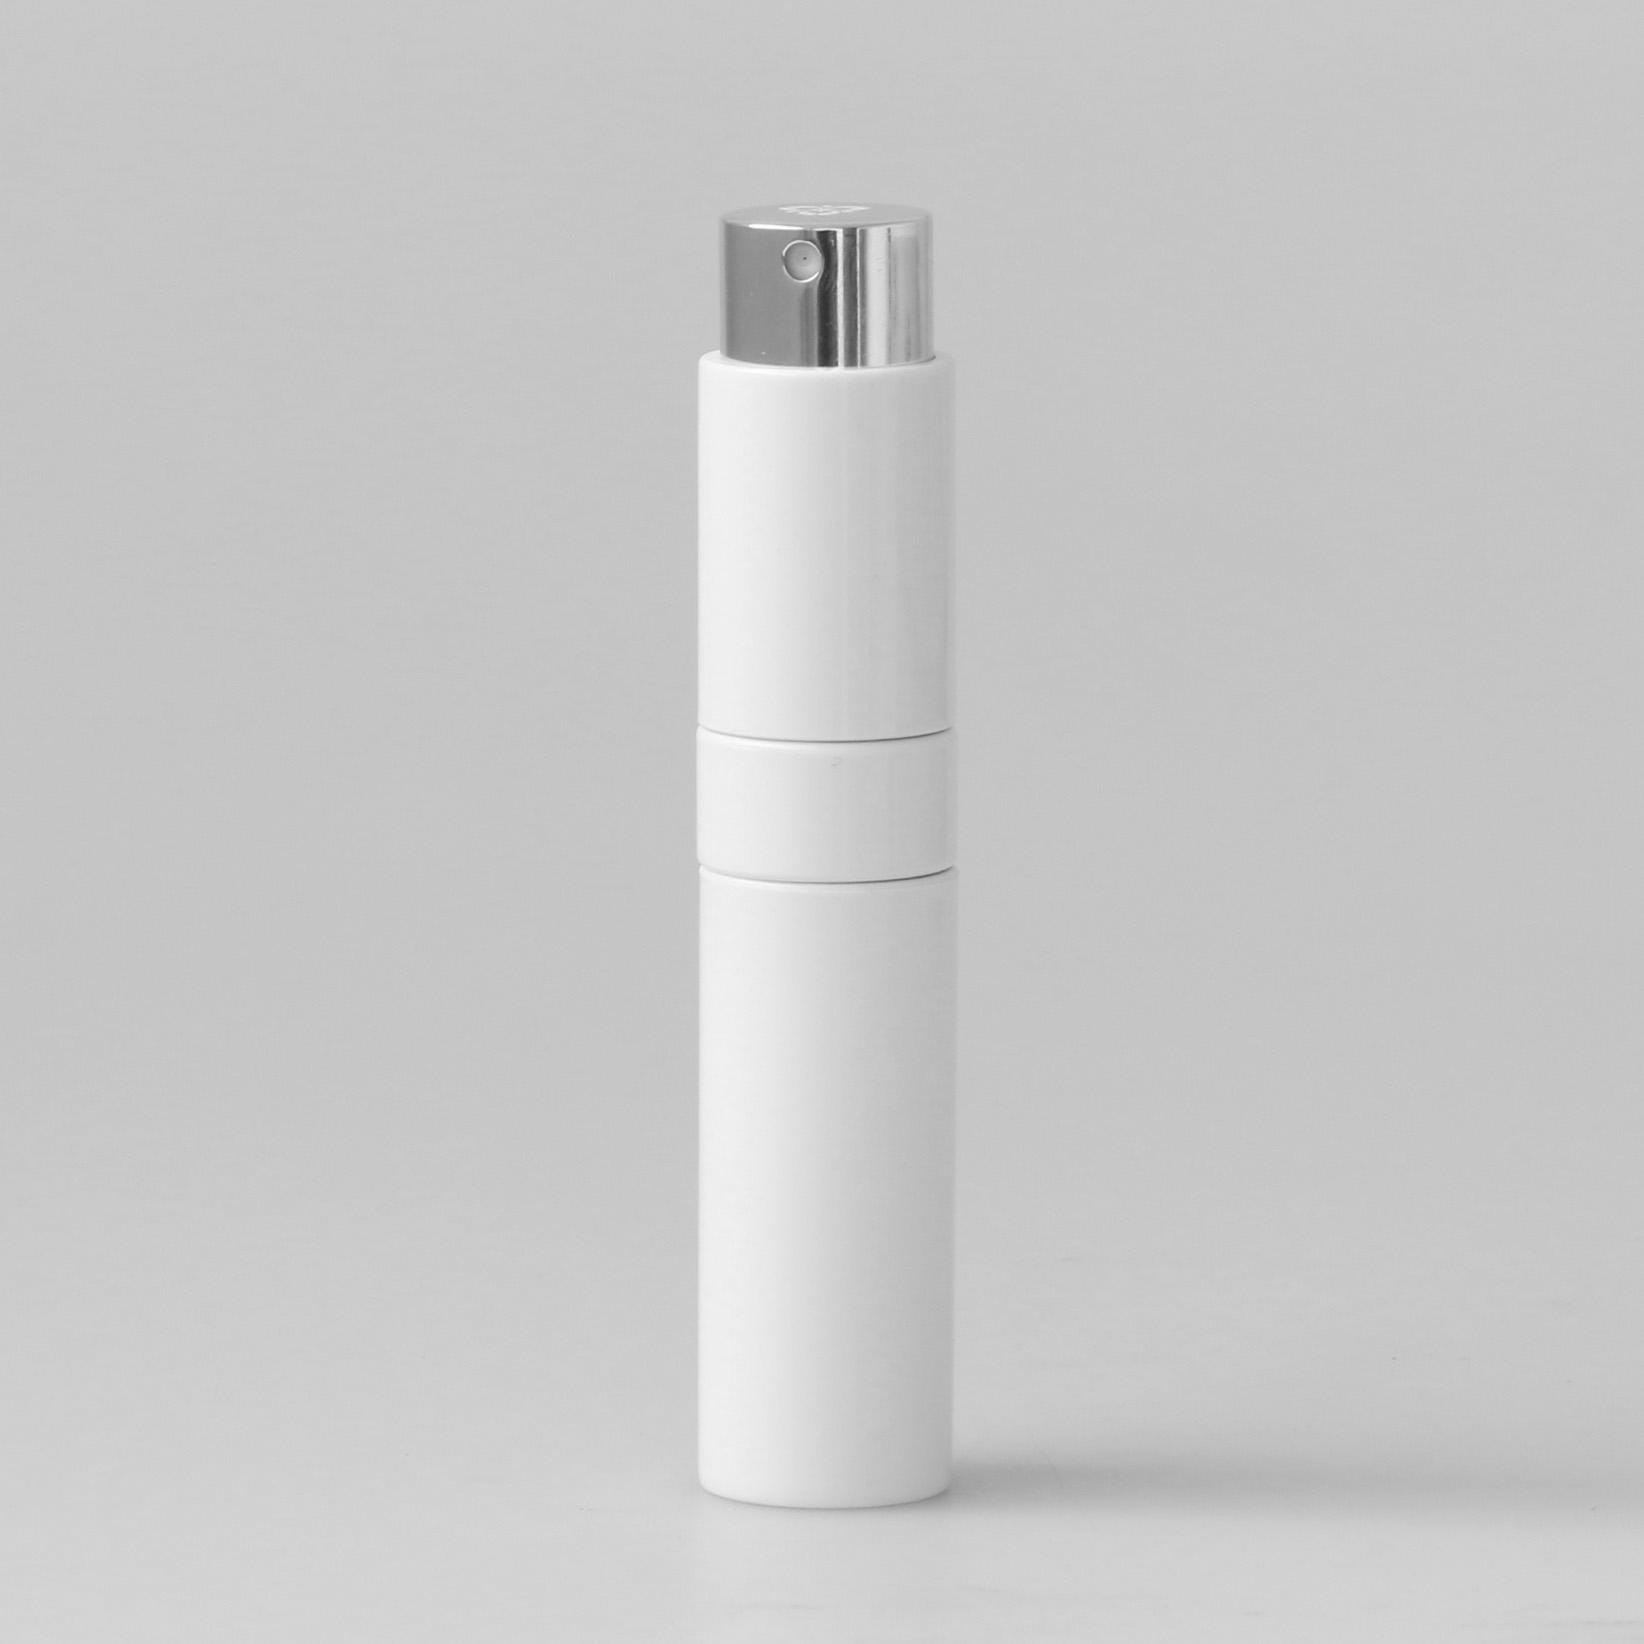 10ml Plastic twist up perfume atomizer Featured Image